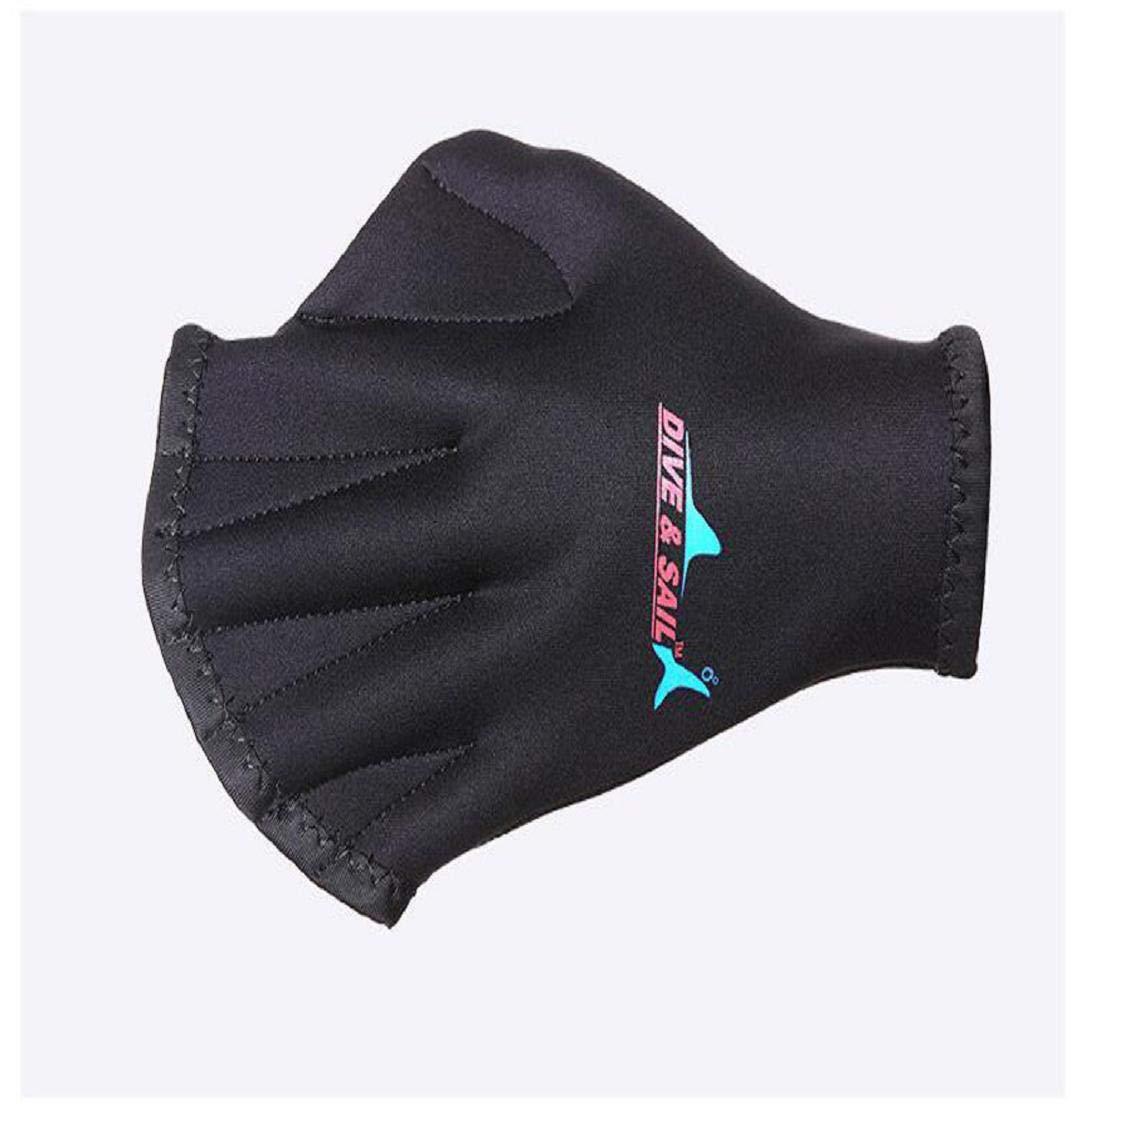 Nataci/ón//Surf//Buceo//Snorkling//Vela//Kayak//Pirag/üismo//Jetski//Accesorios de Neopreno//Accesorios de Trajes de Neopreno Koojawind/Paddle Glove Webbed Glove